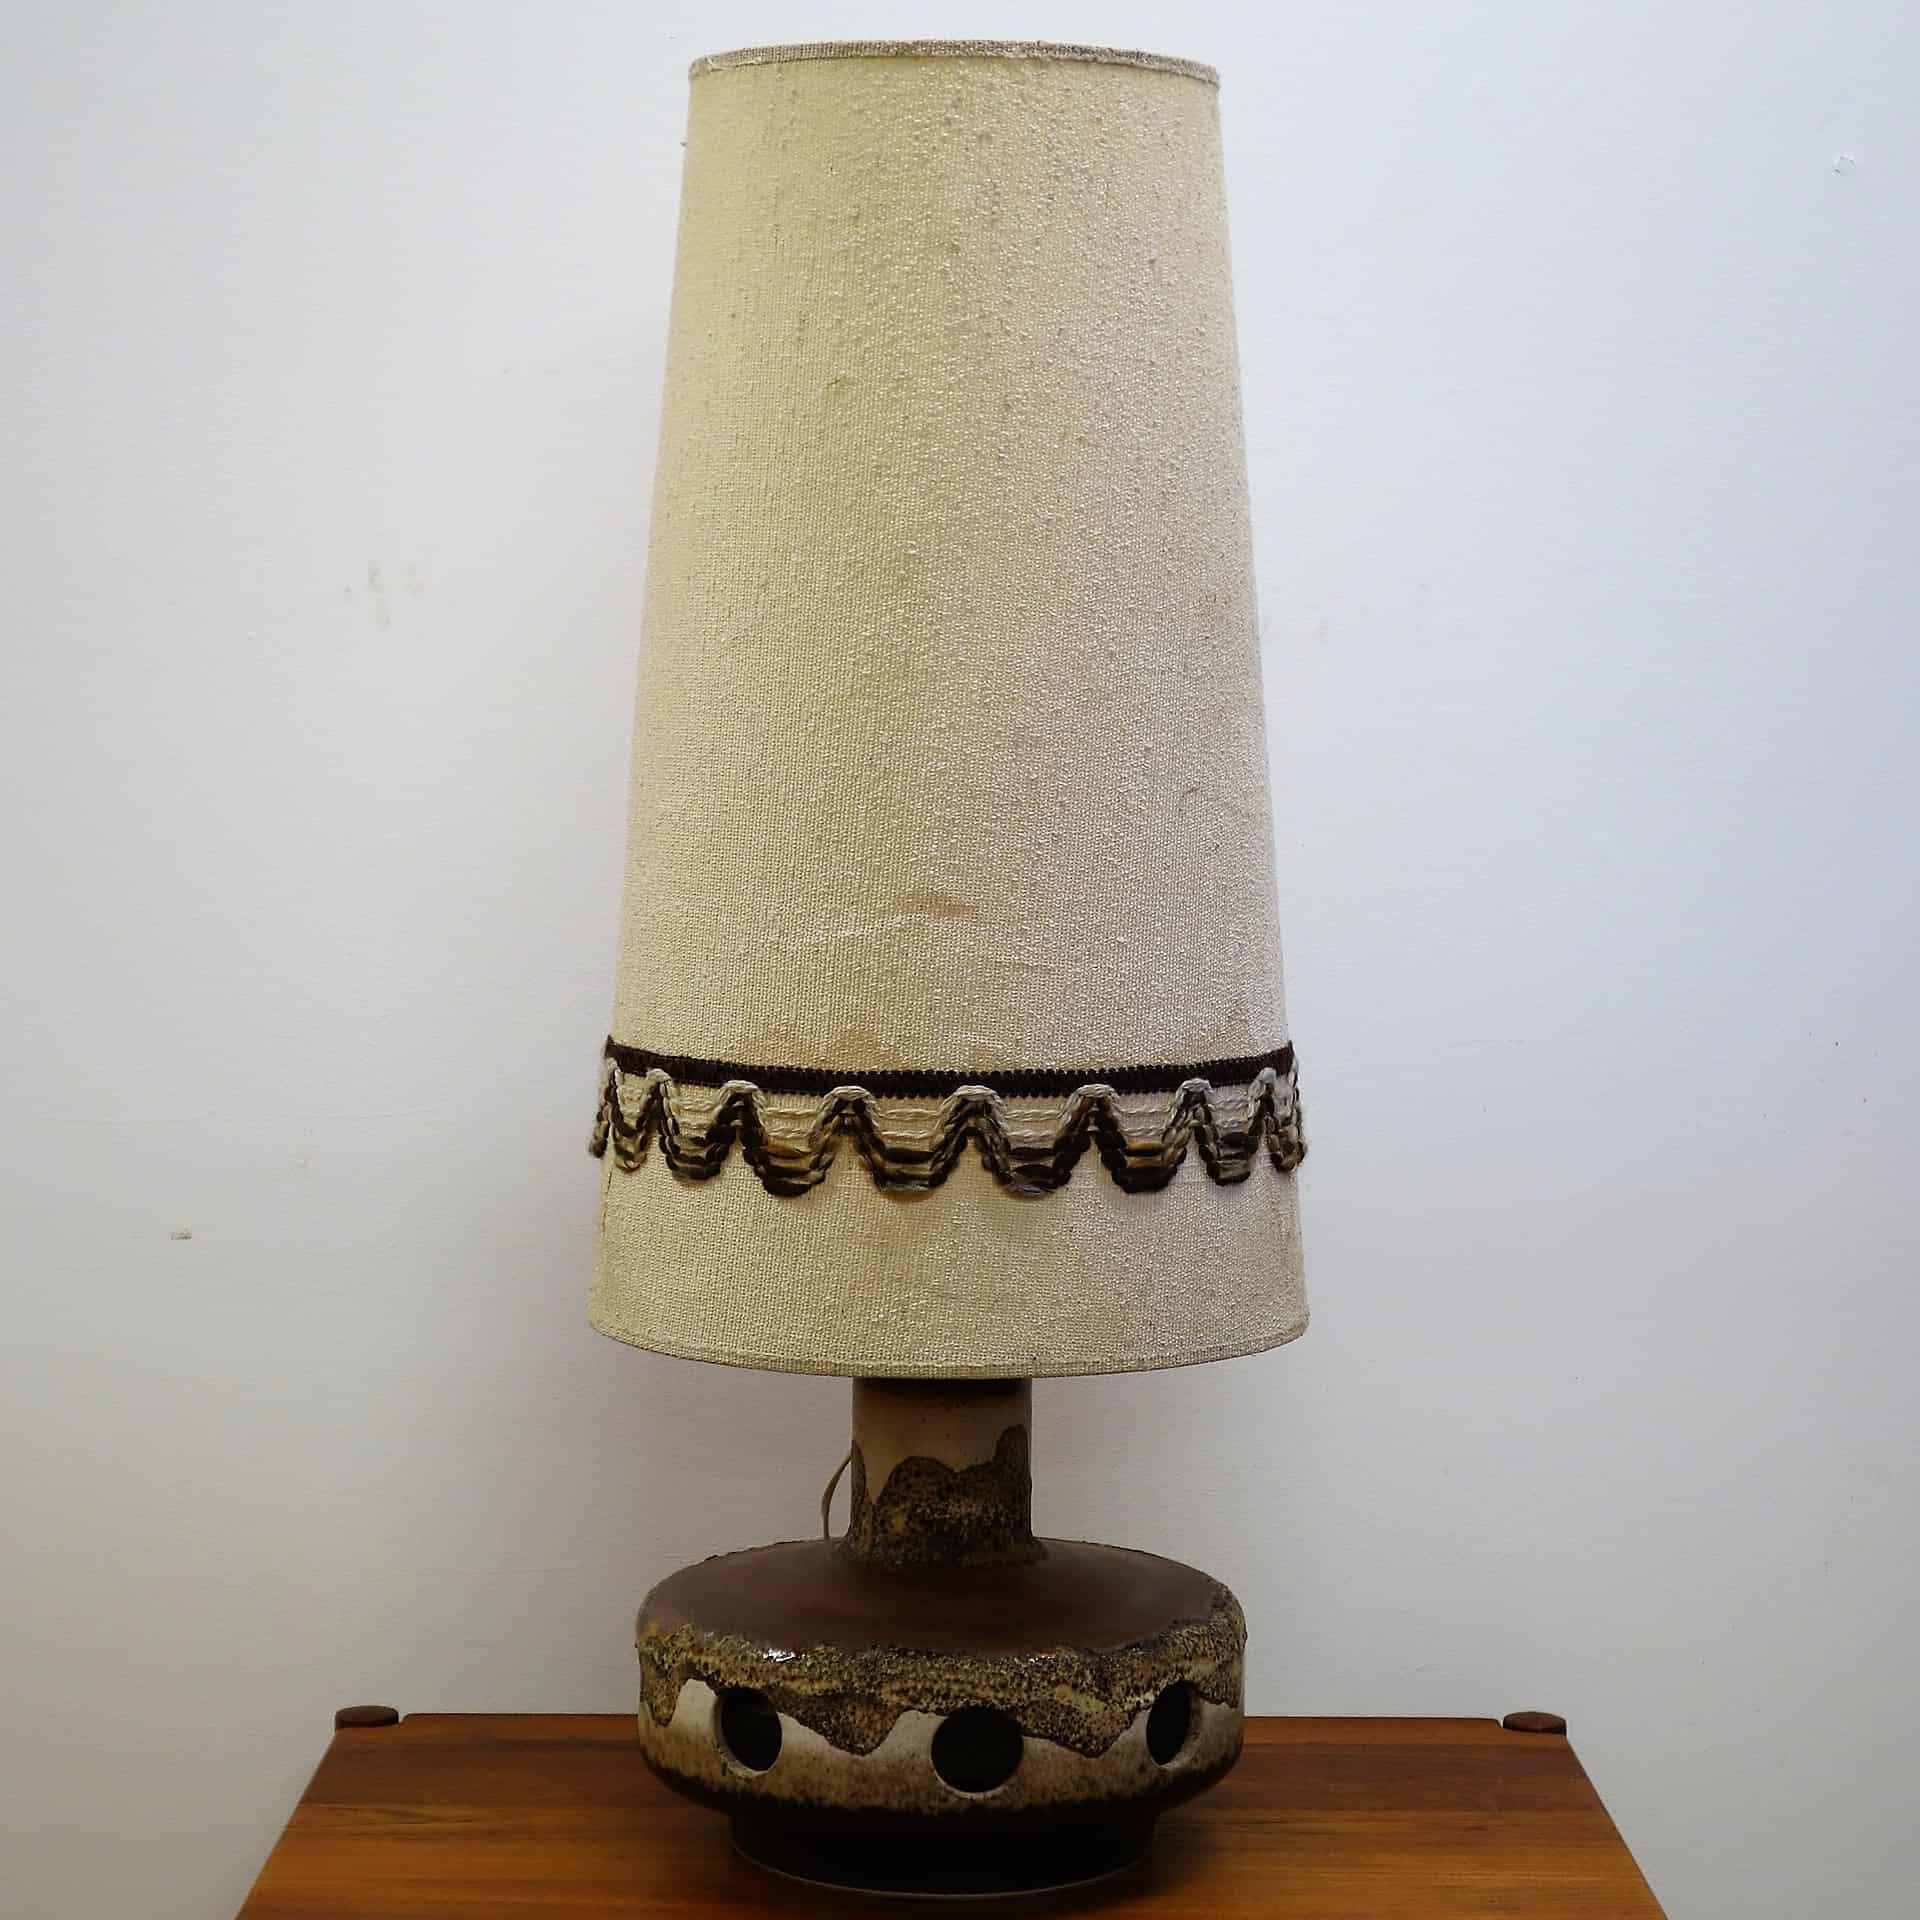 1970s West German ceramic table lamp